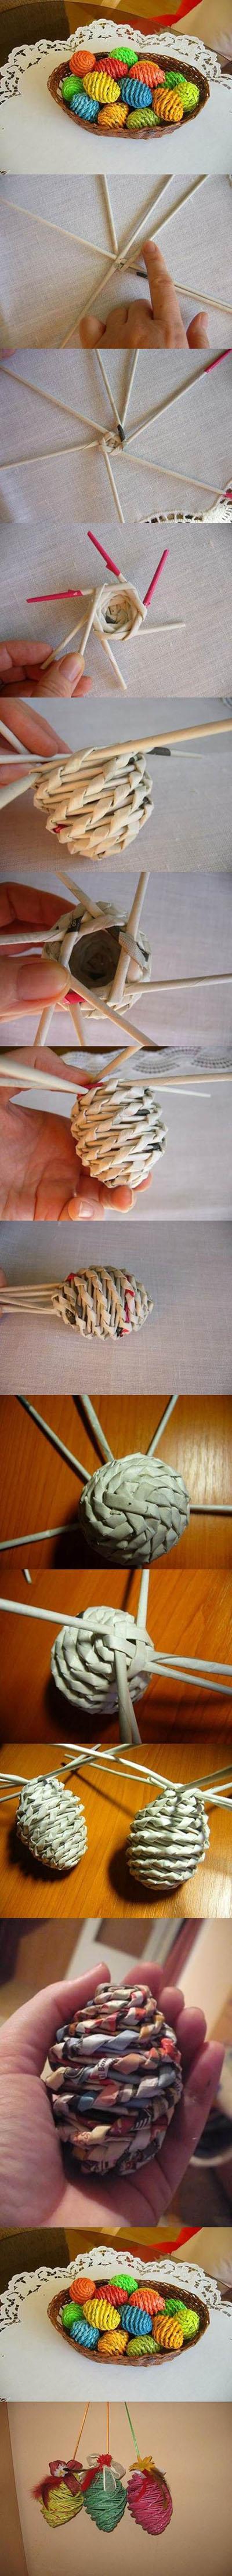 DIY Woven Paper Easter Eggs | DIY & Crafts Tutorials